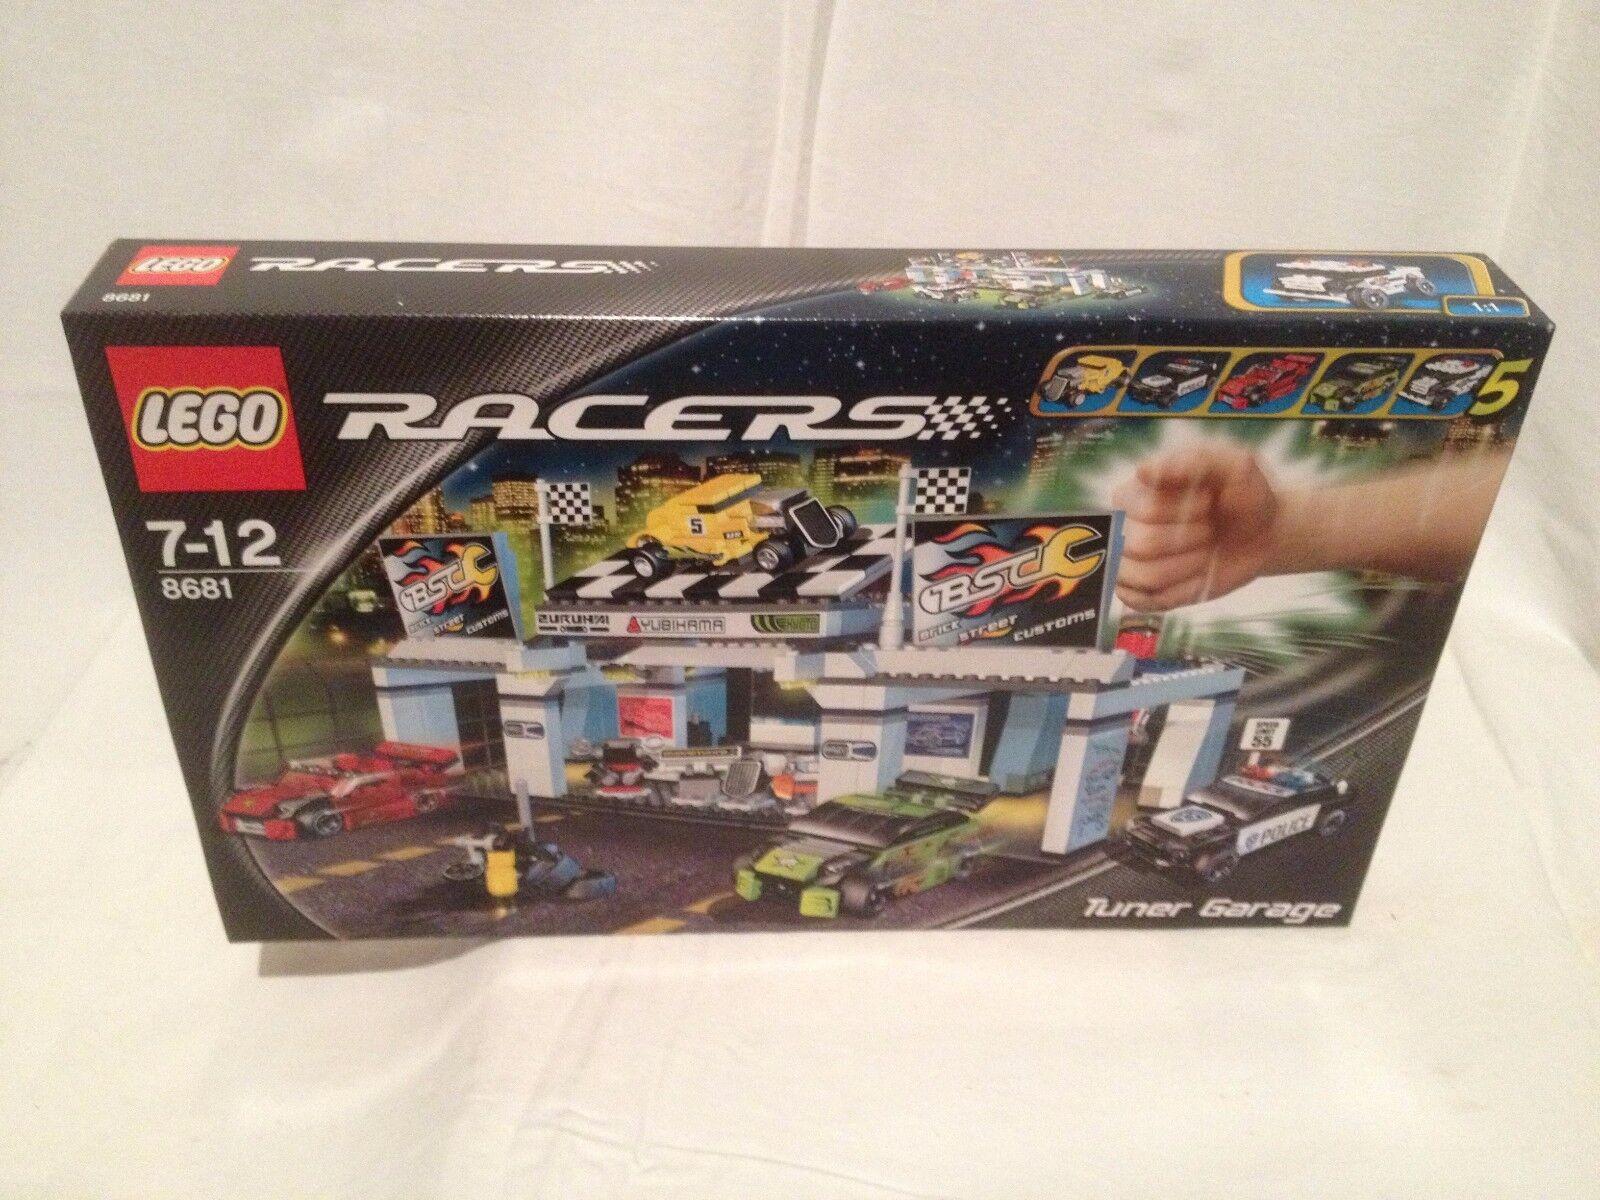 Lego Racer 8681 Tuner Garage NEUF 1 édition